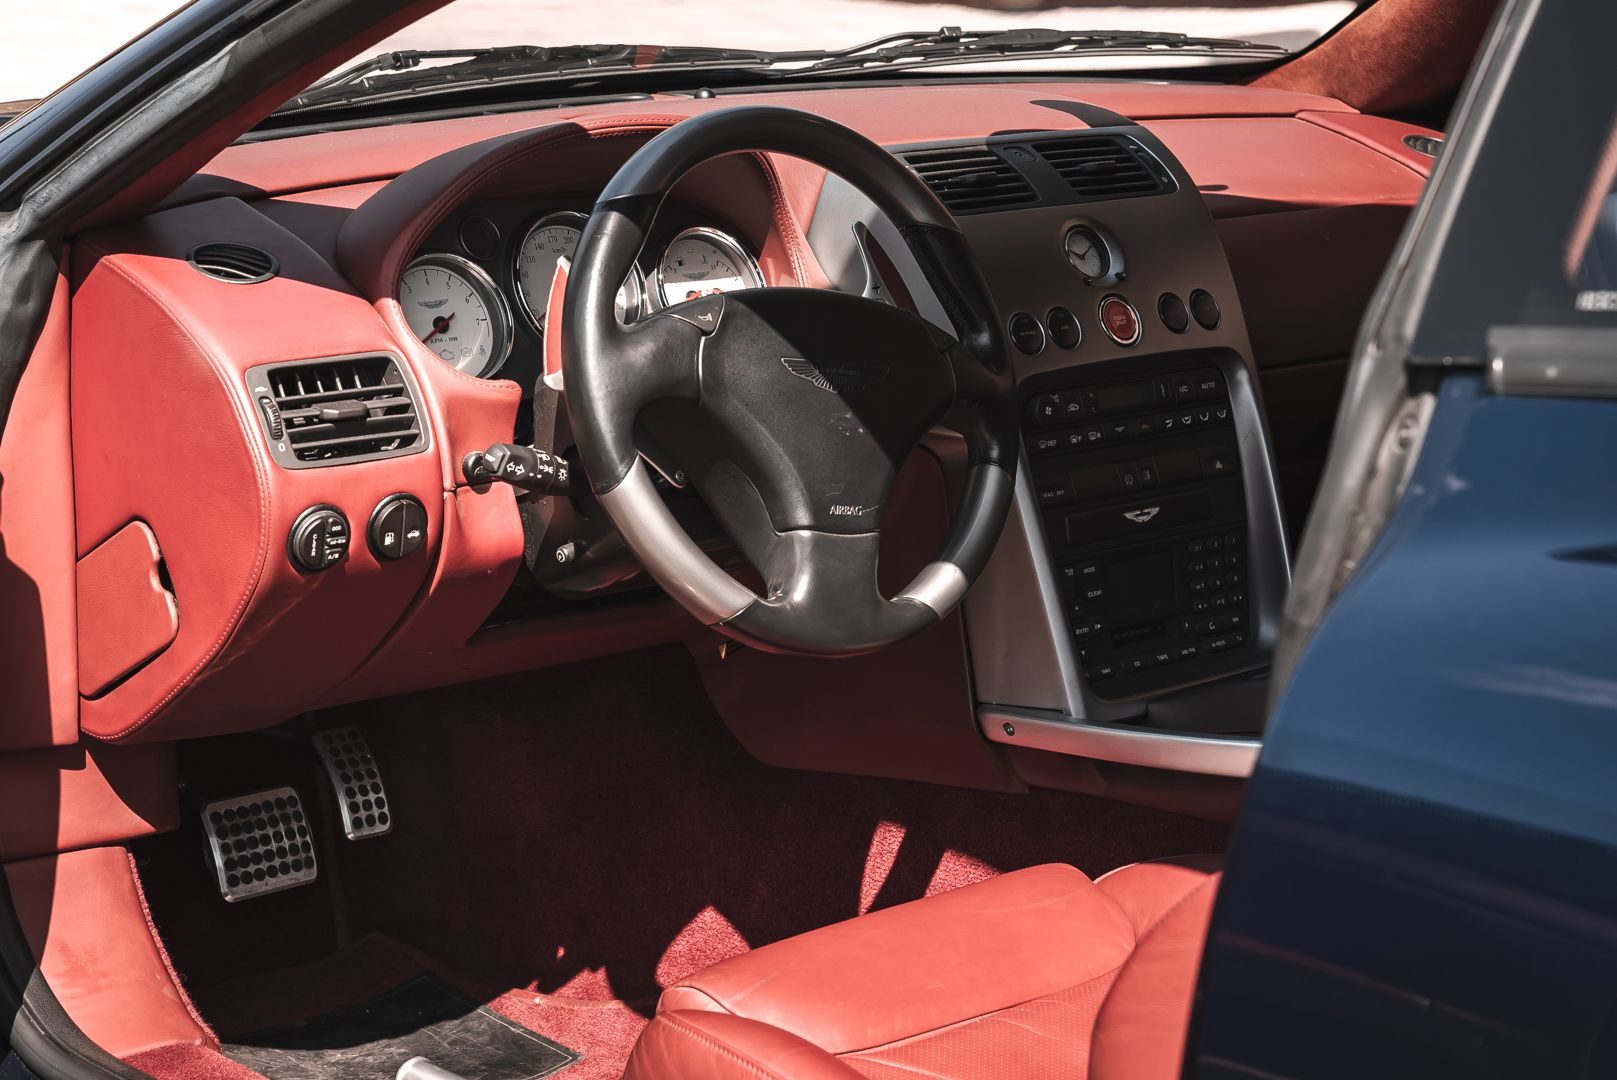 2001 Aston Martin V12 Vanquish 67931